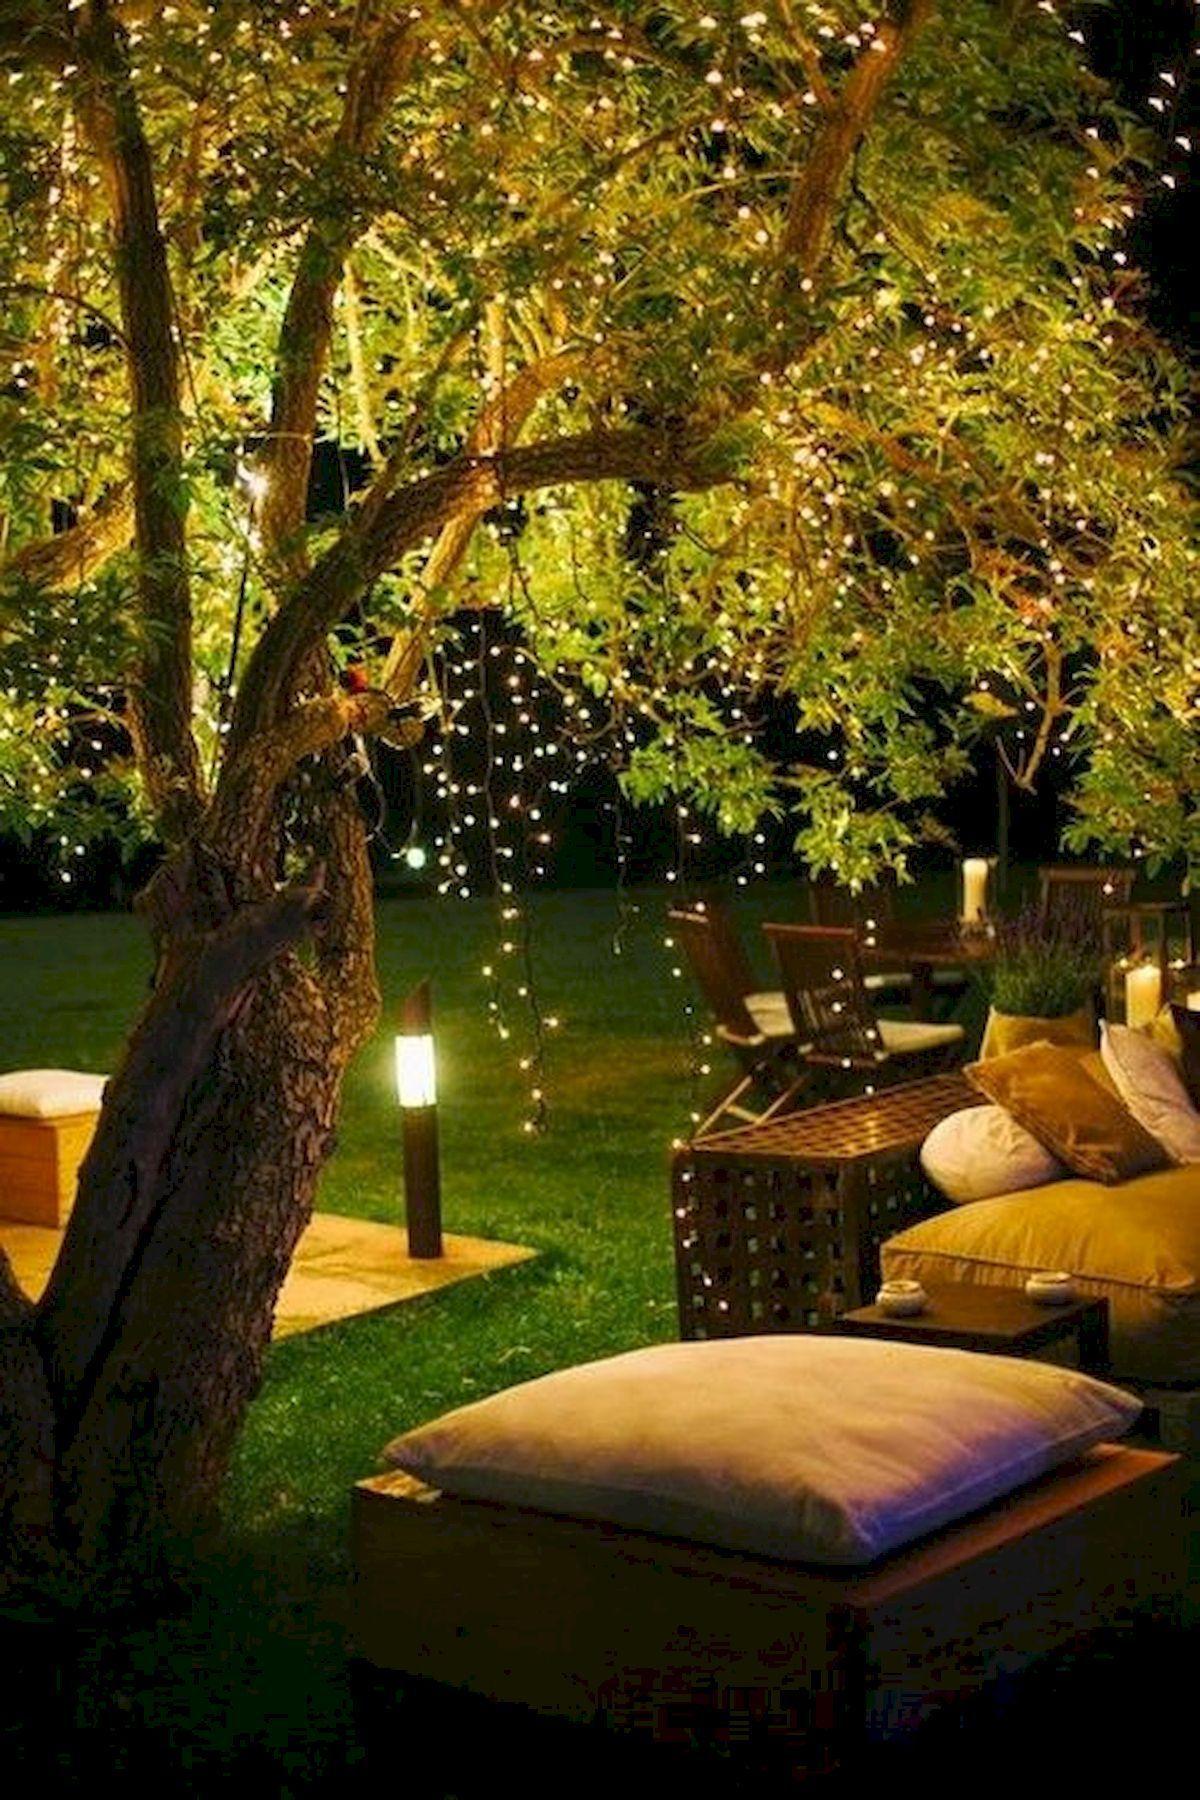 7 Marvelous Garden Lighting Ideas That Liven Up Your Outdoor Area Momo Zain In 2020 Garden Lighting Design Outdoor Decorative Lights Backyard Trees